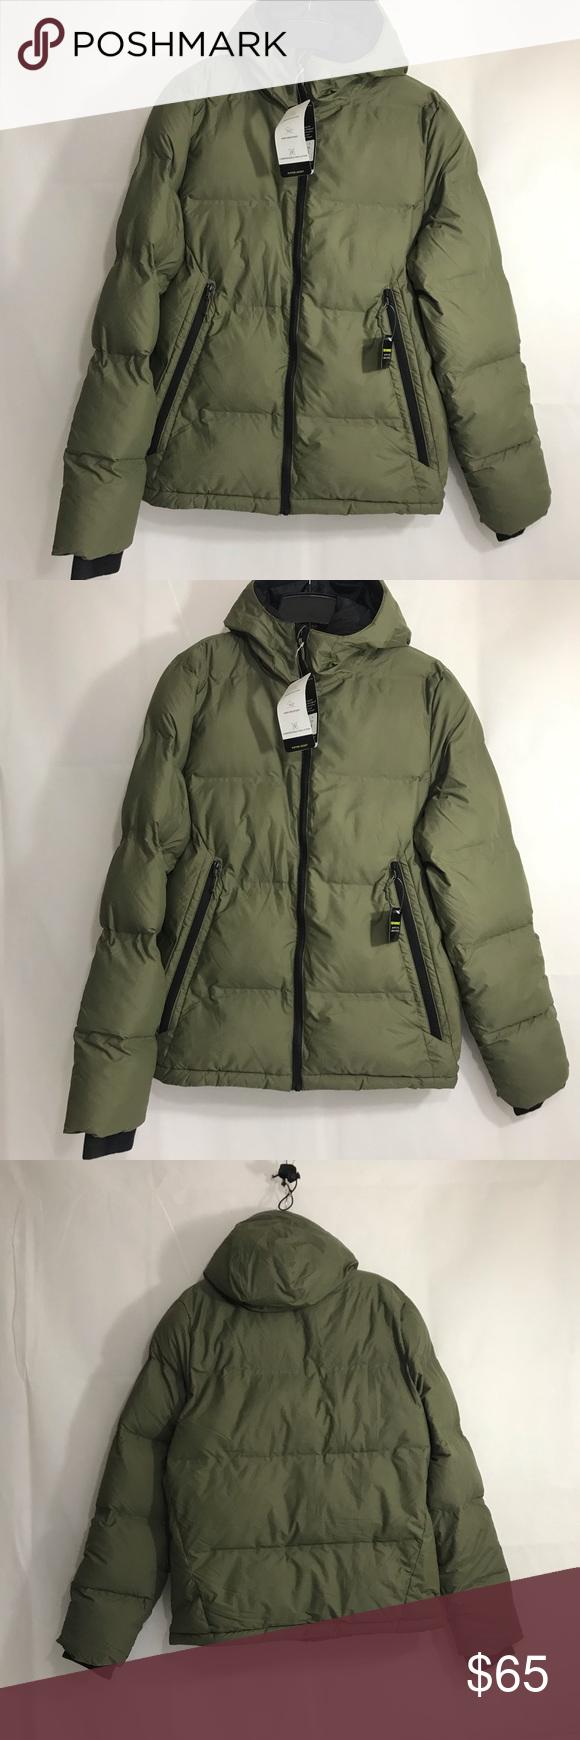 Green Champion Winter Jacket Winter Jackets Jackets Fashion [ 1740 x 580 Pixel ]